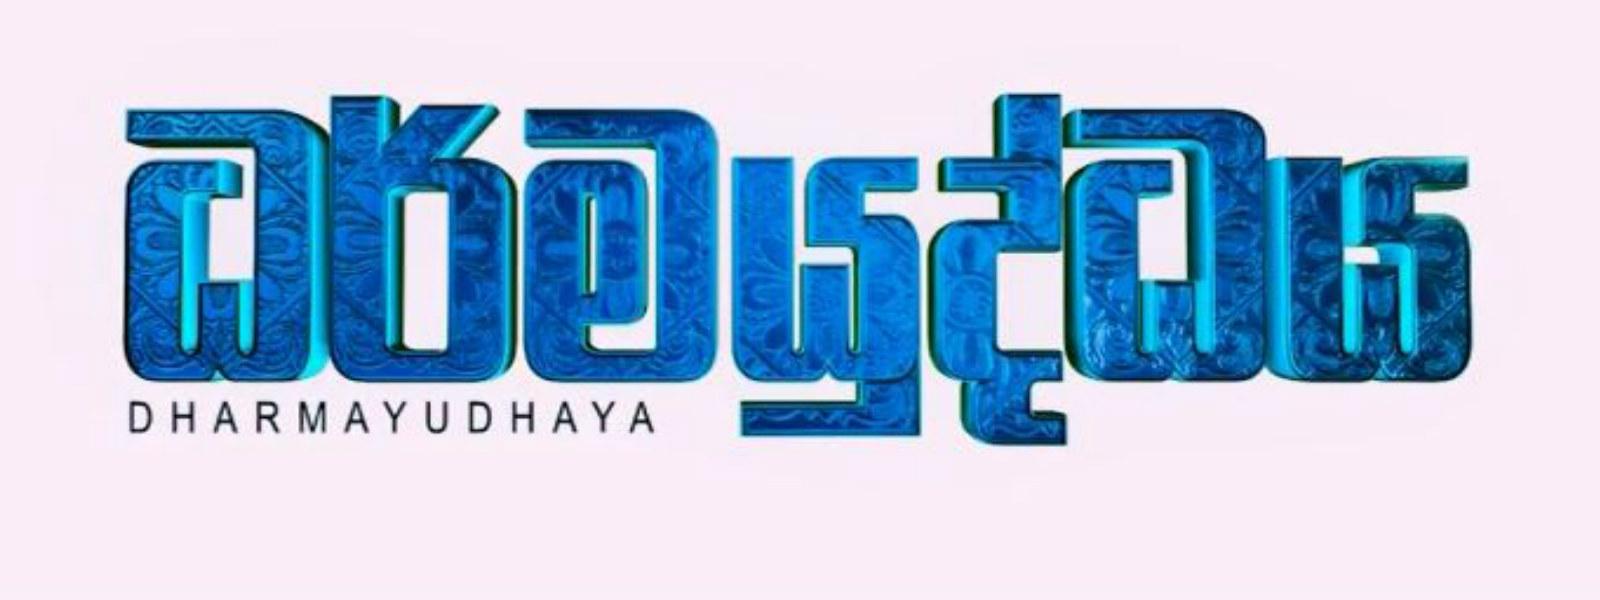 """Dharmayuddaya"" secures big win at 19th Presidential Cinema awards"